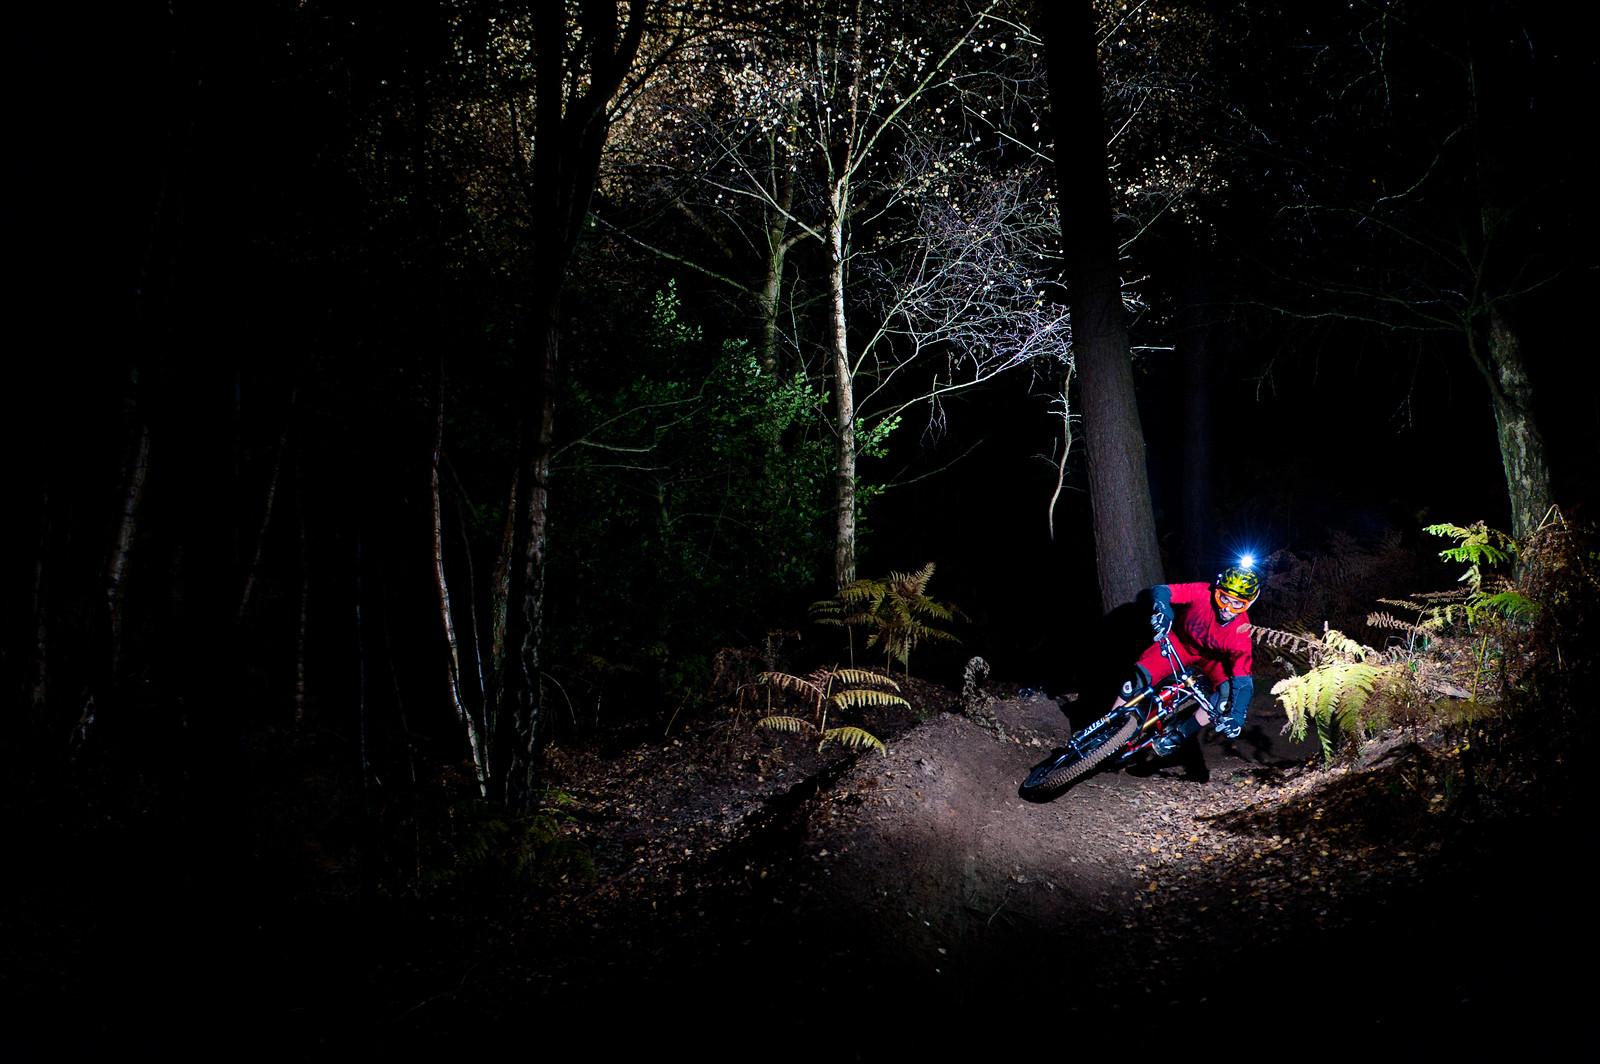 Slaying the Night - Deanscottphoto - Mountain Biking Pictures - Vital MTB